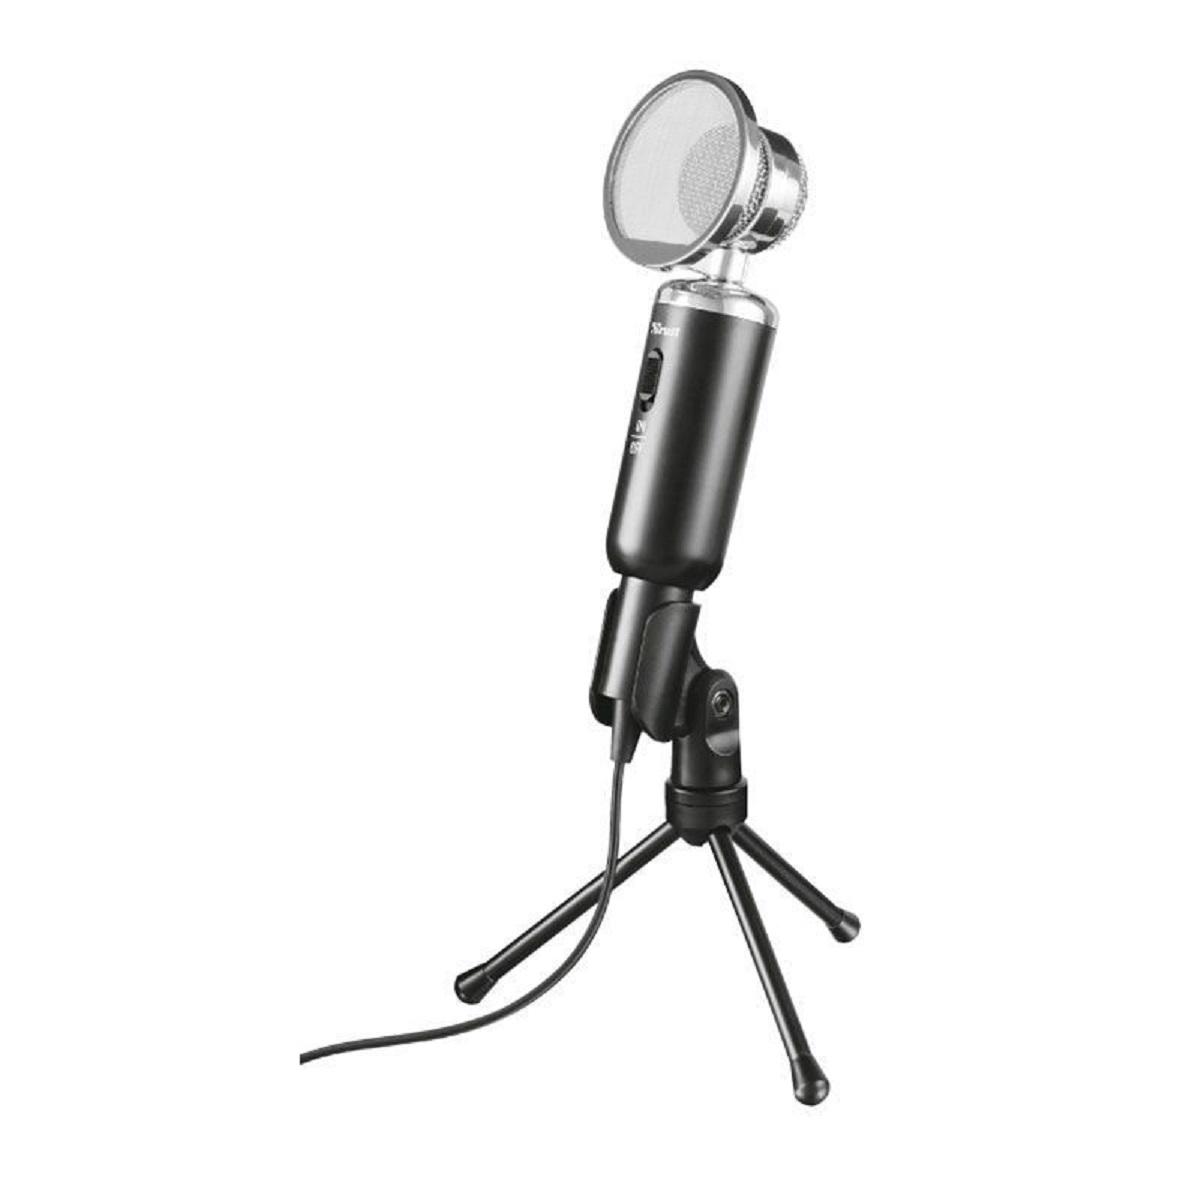 Microfone Trust Madell Desk T21672